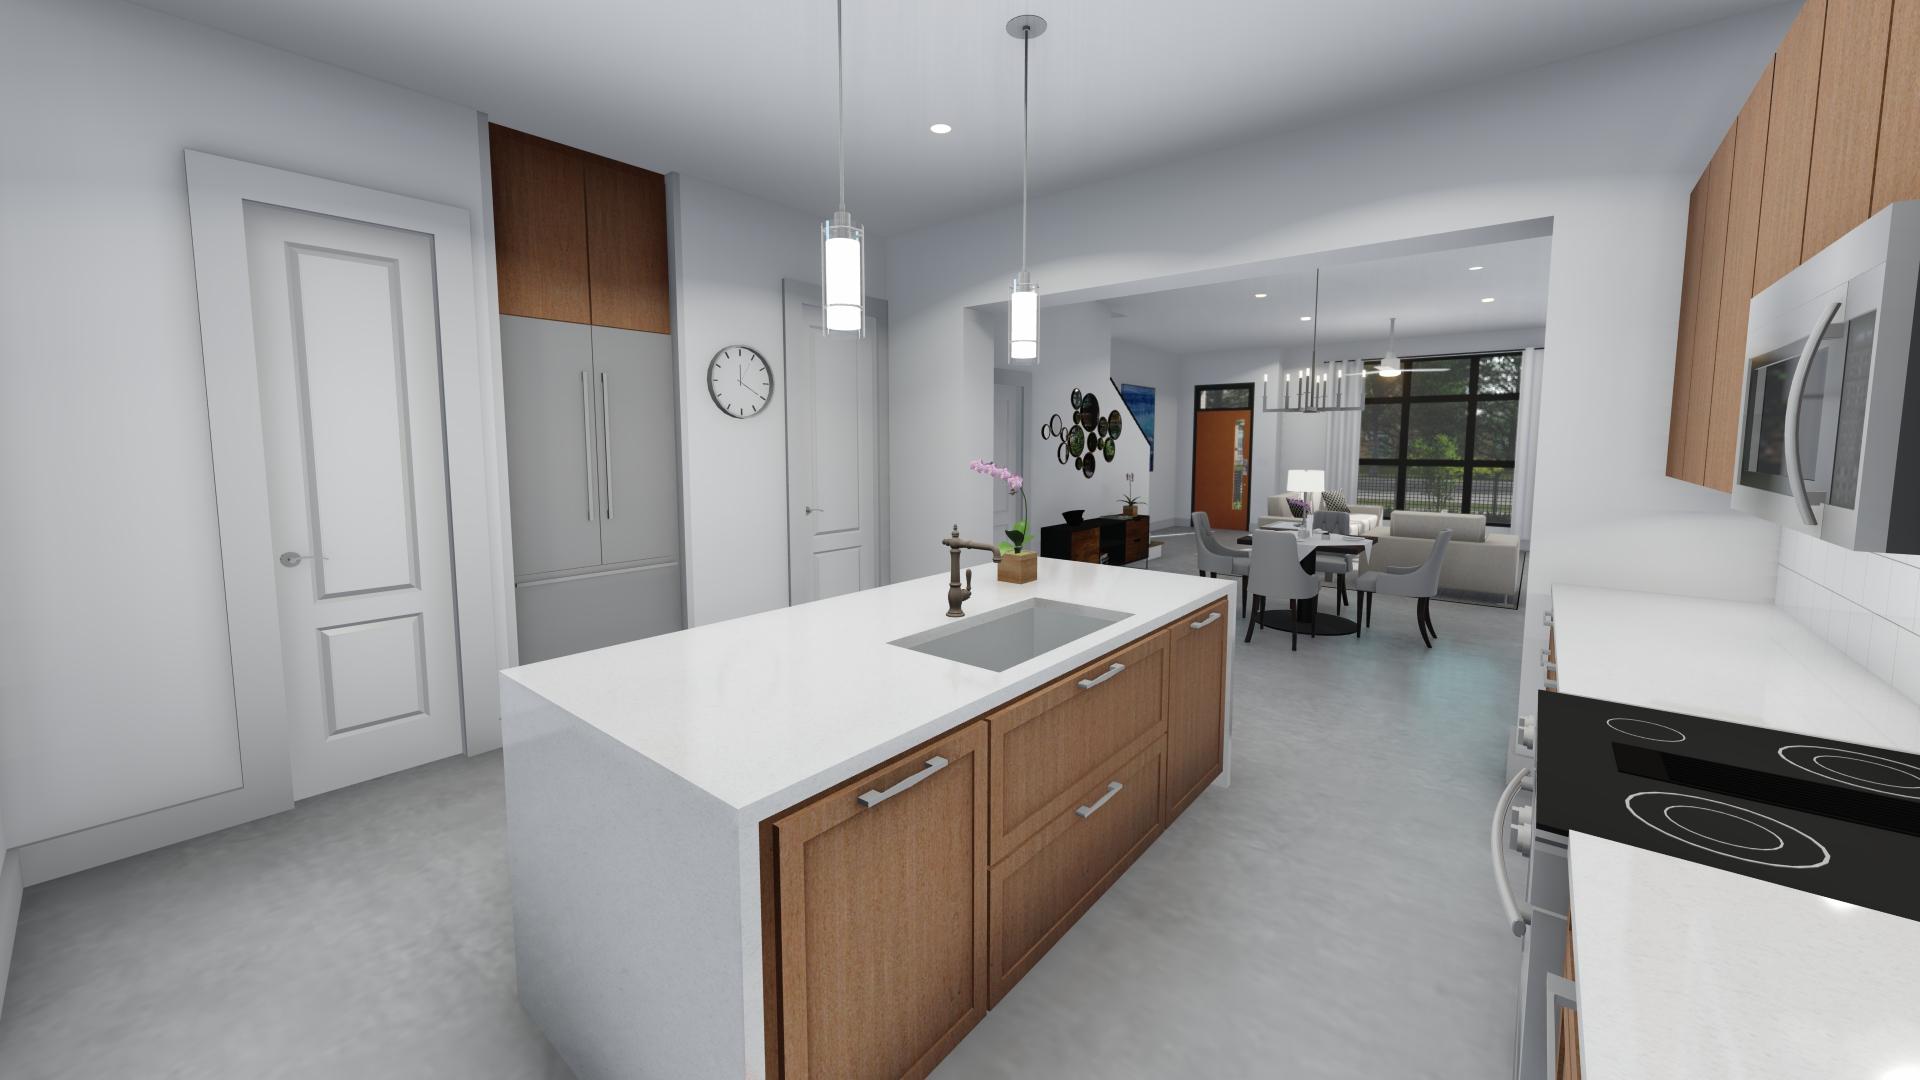 New Wayside interior rendering_Photo - 9.jpg